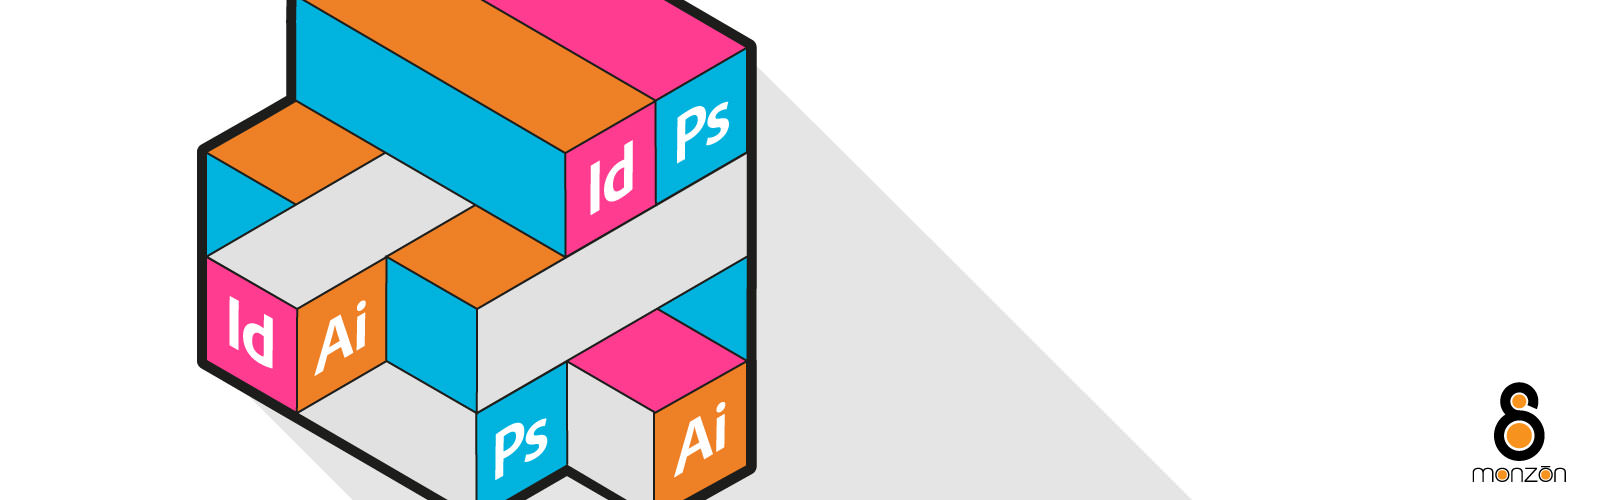 Imagen Curso Illustrator+Photoshop+Indesign